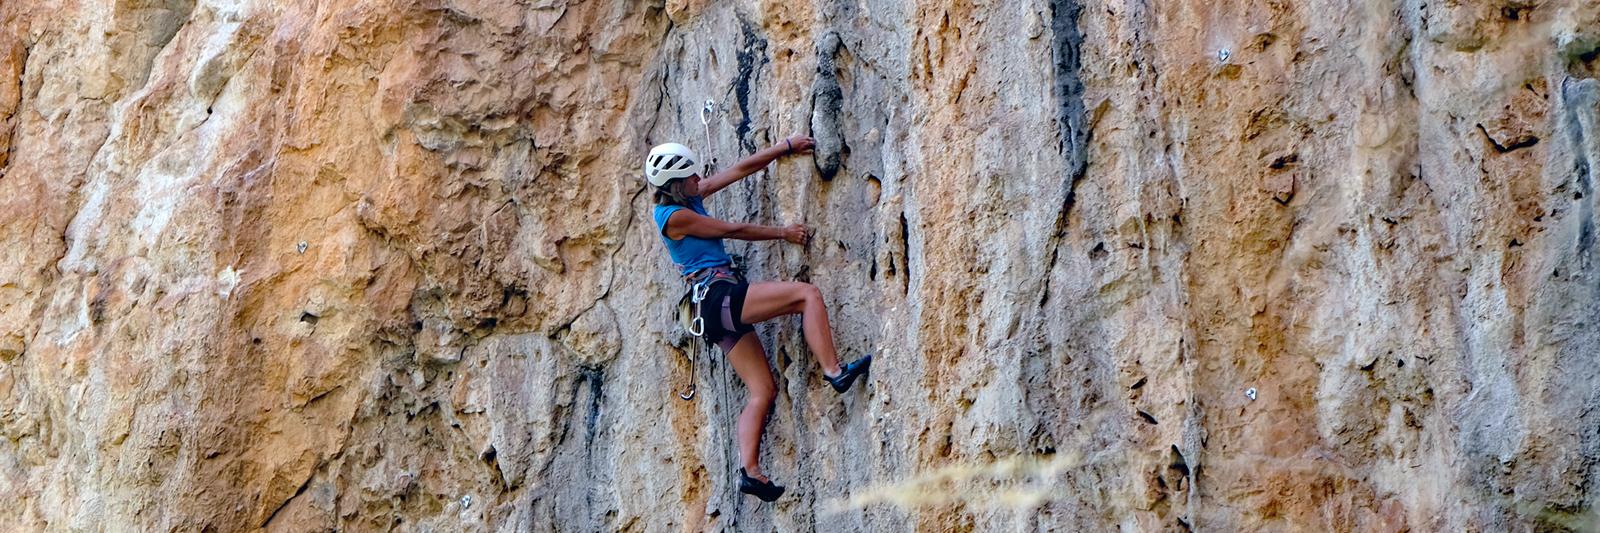 Sport Climbing Holiday Costa Blanca Desiree Verbeek_DSF4404